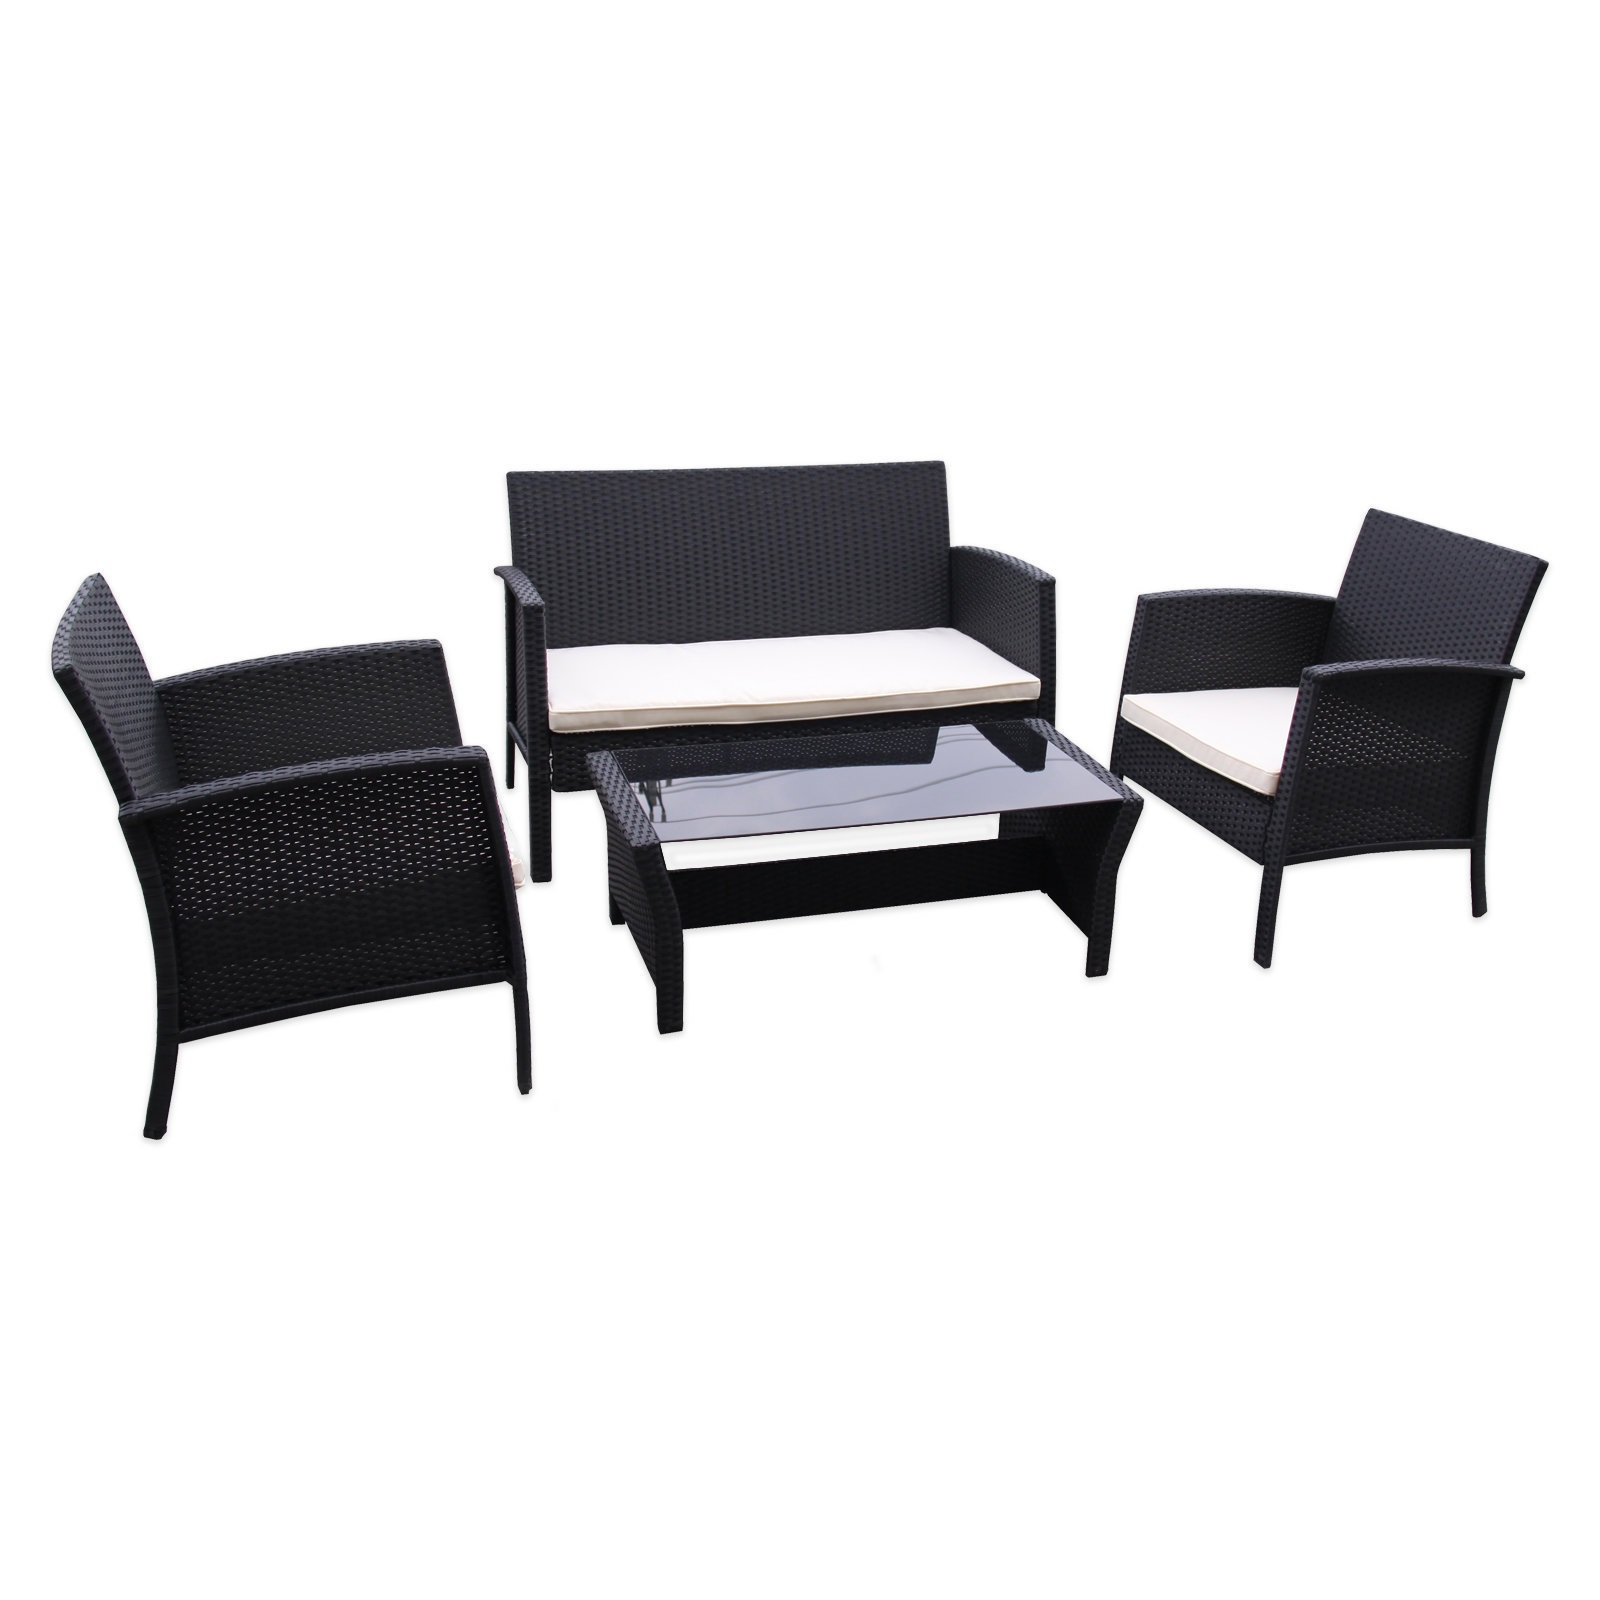 Lounge-Sitzgruppe Sirmione Image